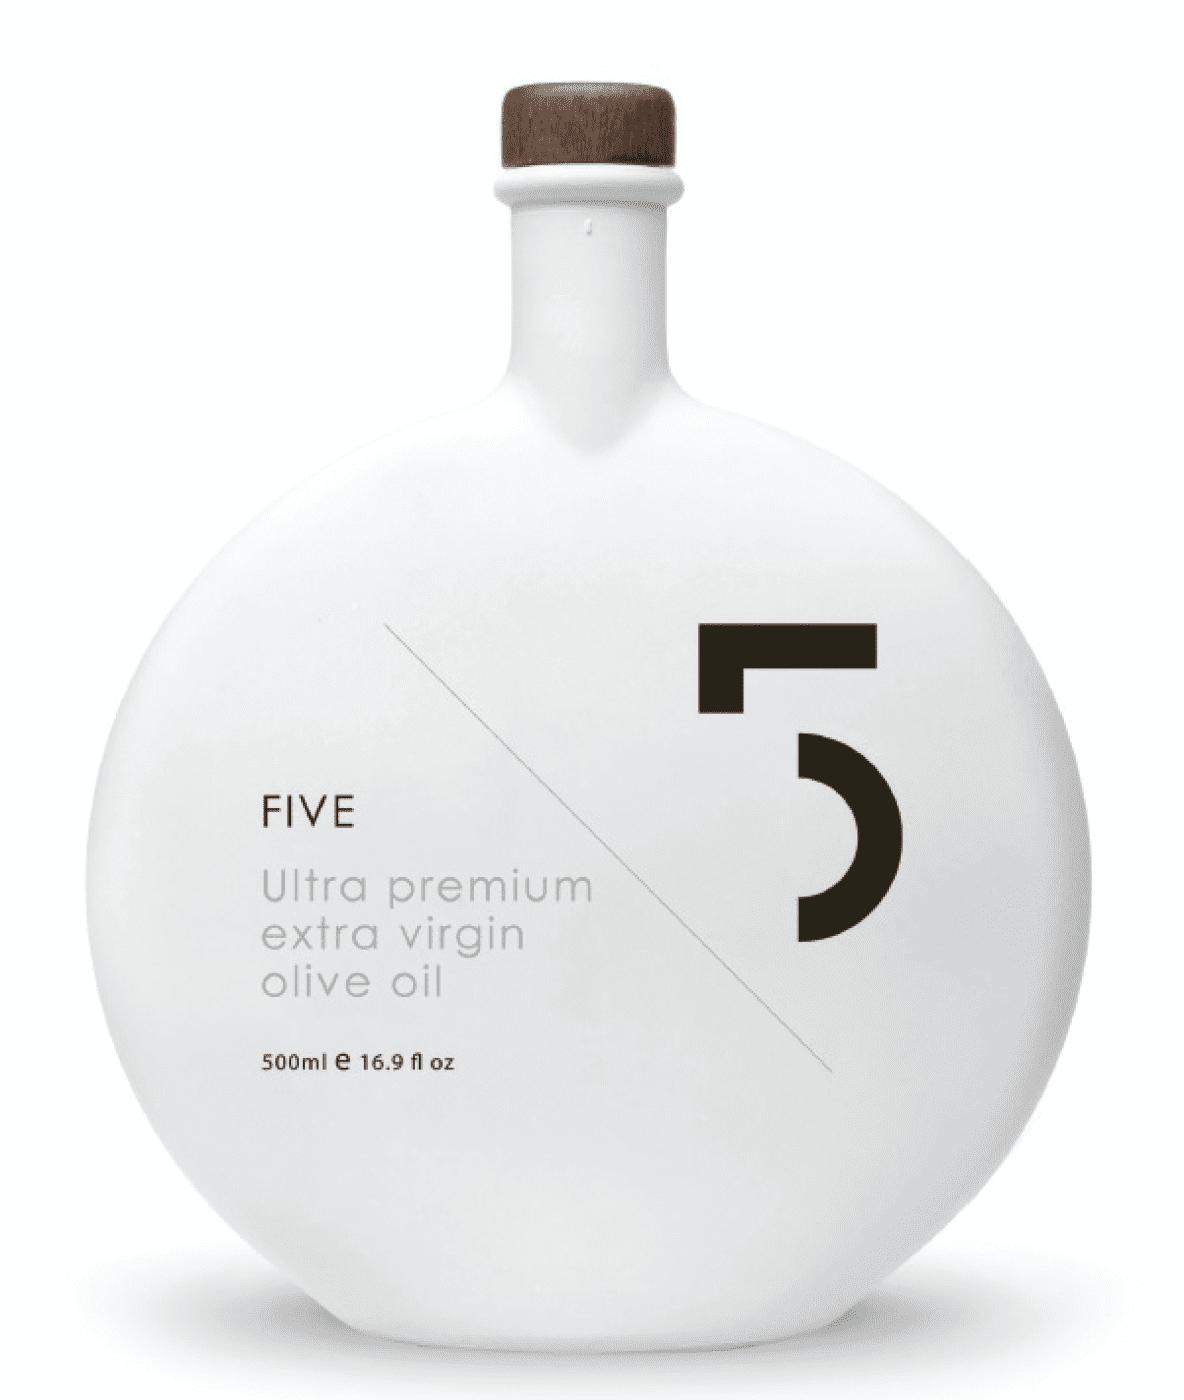 5 ultra premium extra virgin olive oil